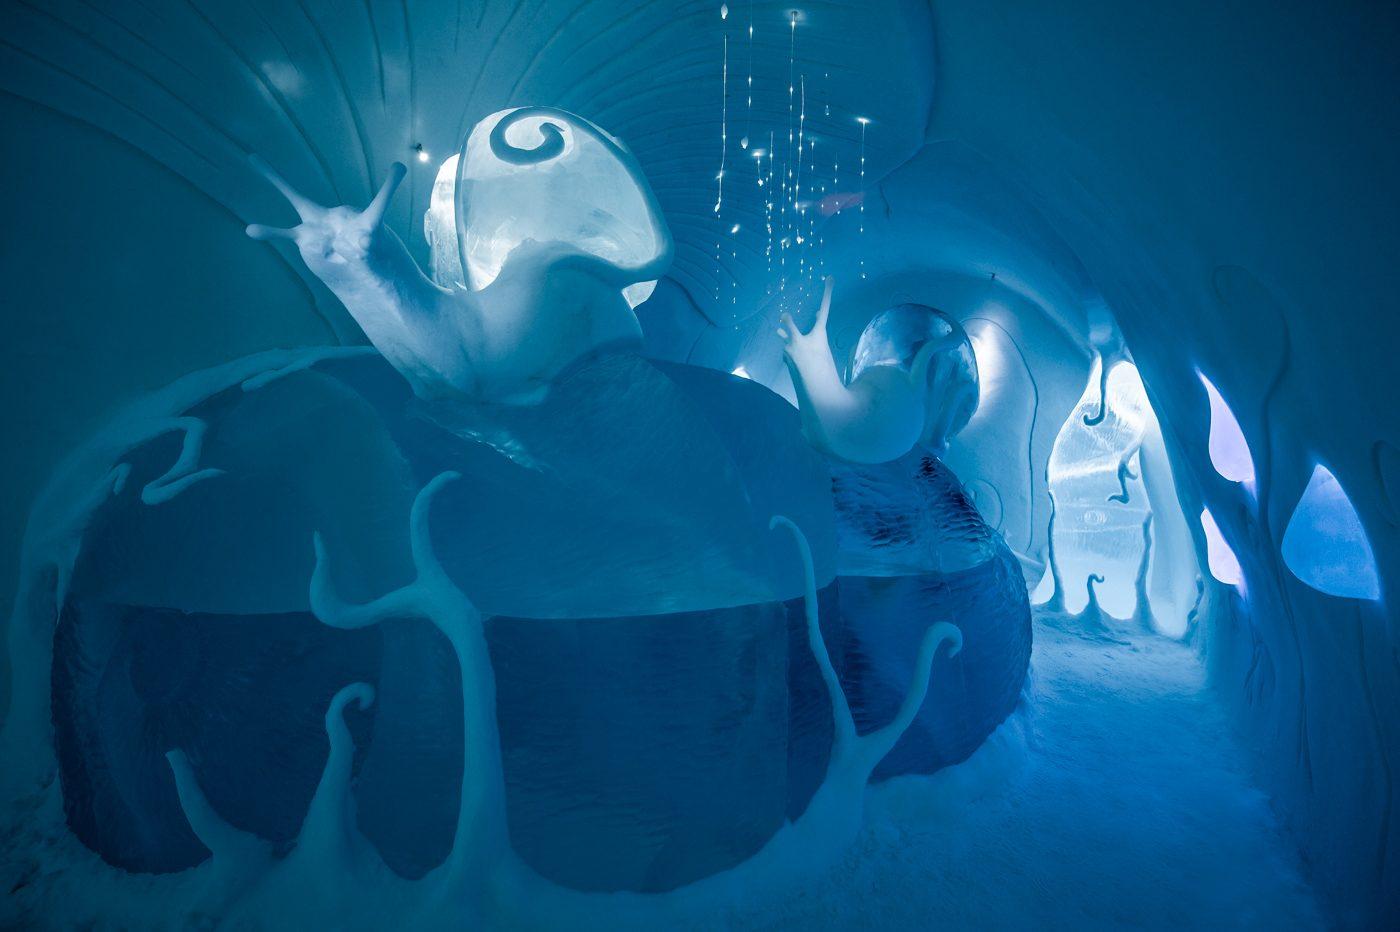 art-suite-ground-rules-icehotel-28-1400x932-1.jpg